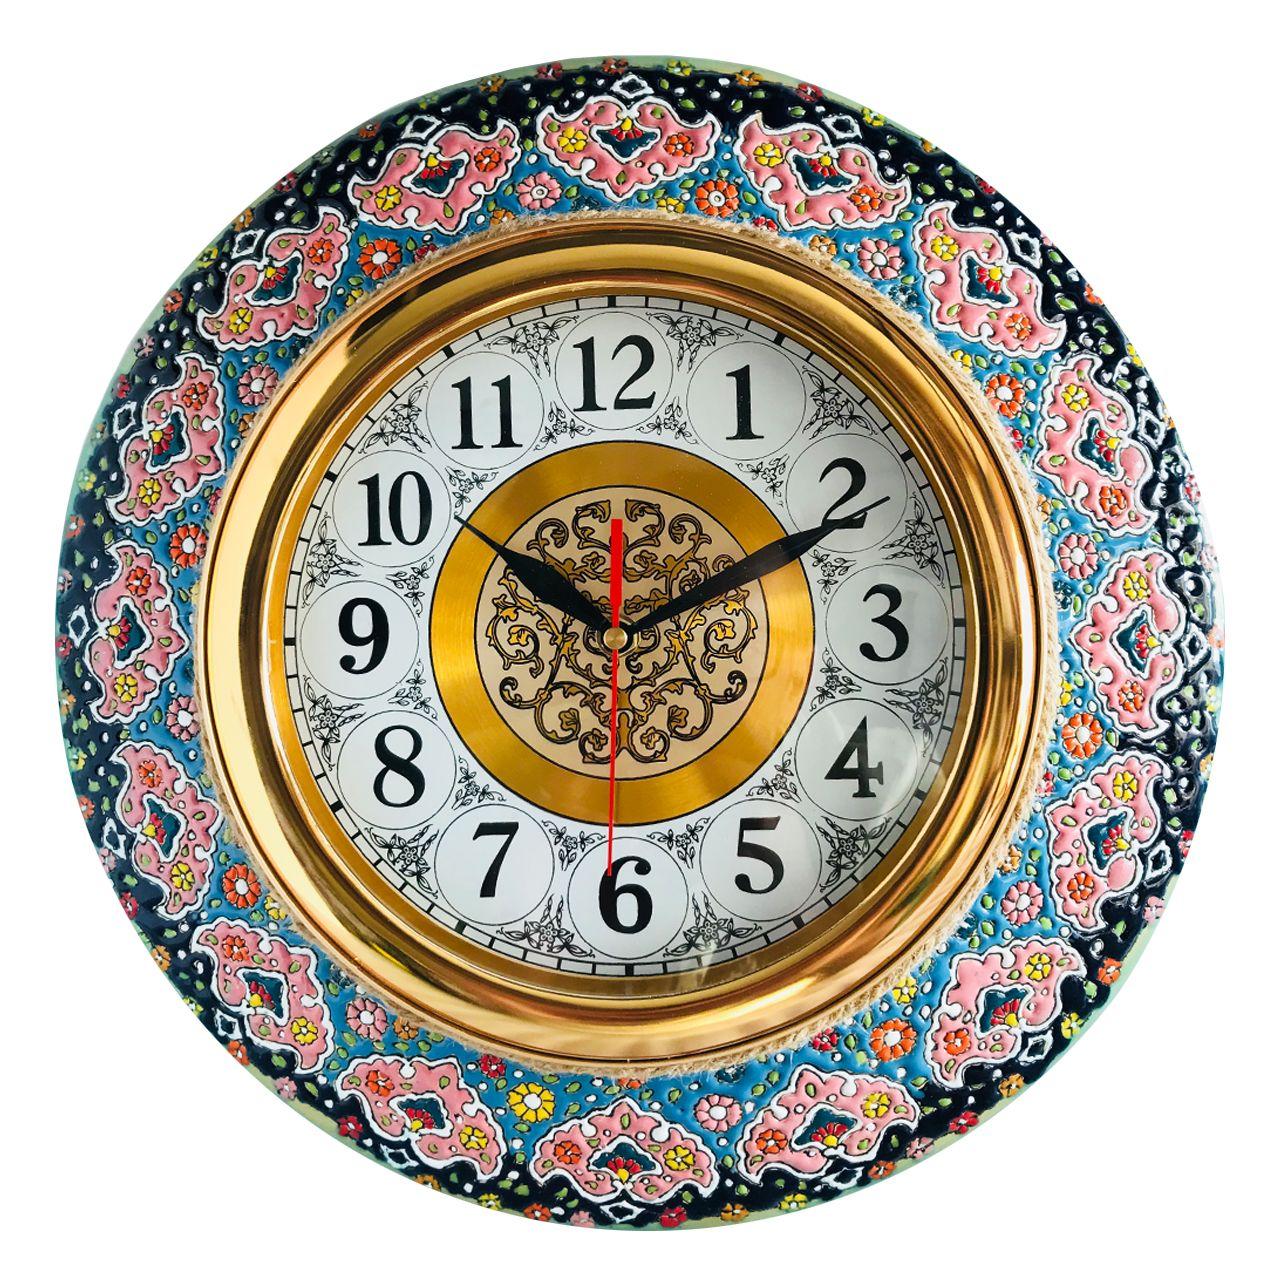 ساعت دیواری میناکاری مدل 1269